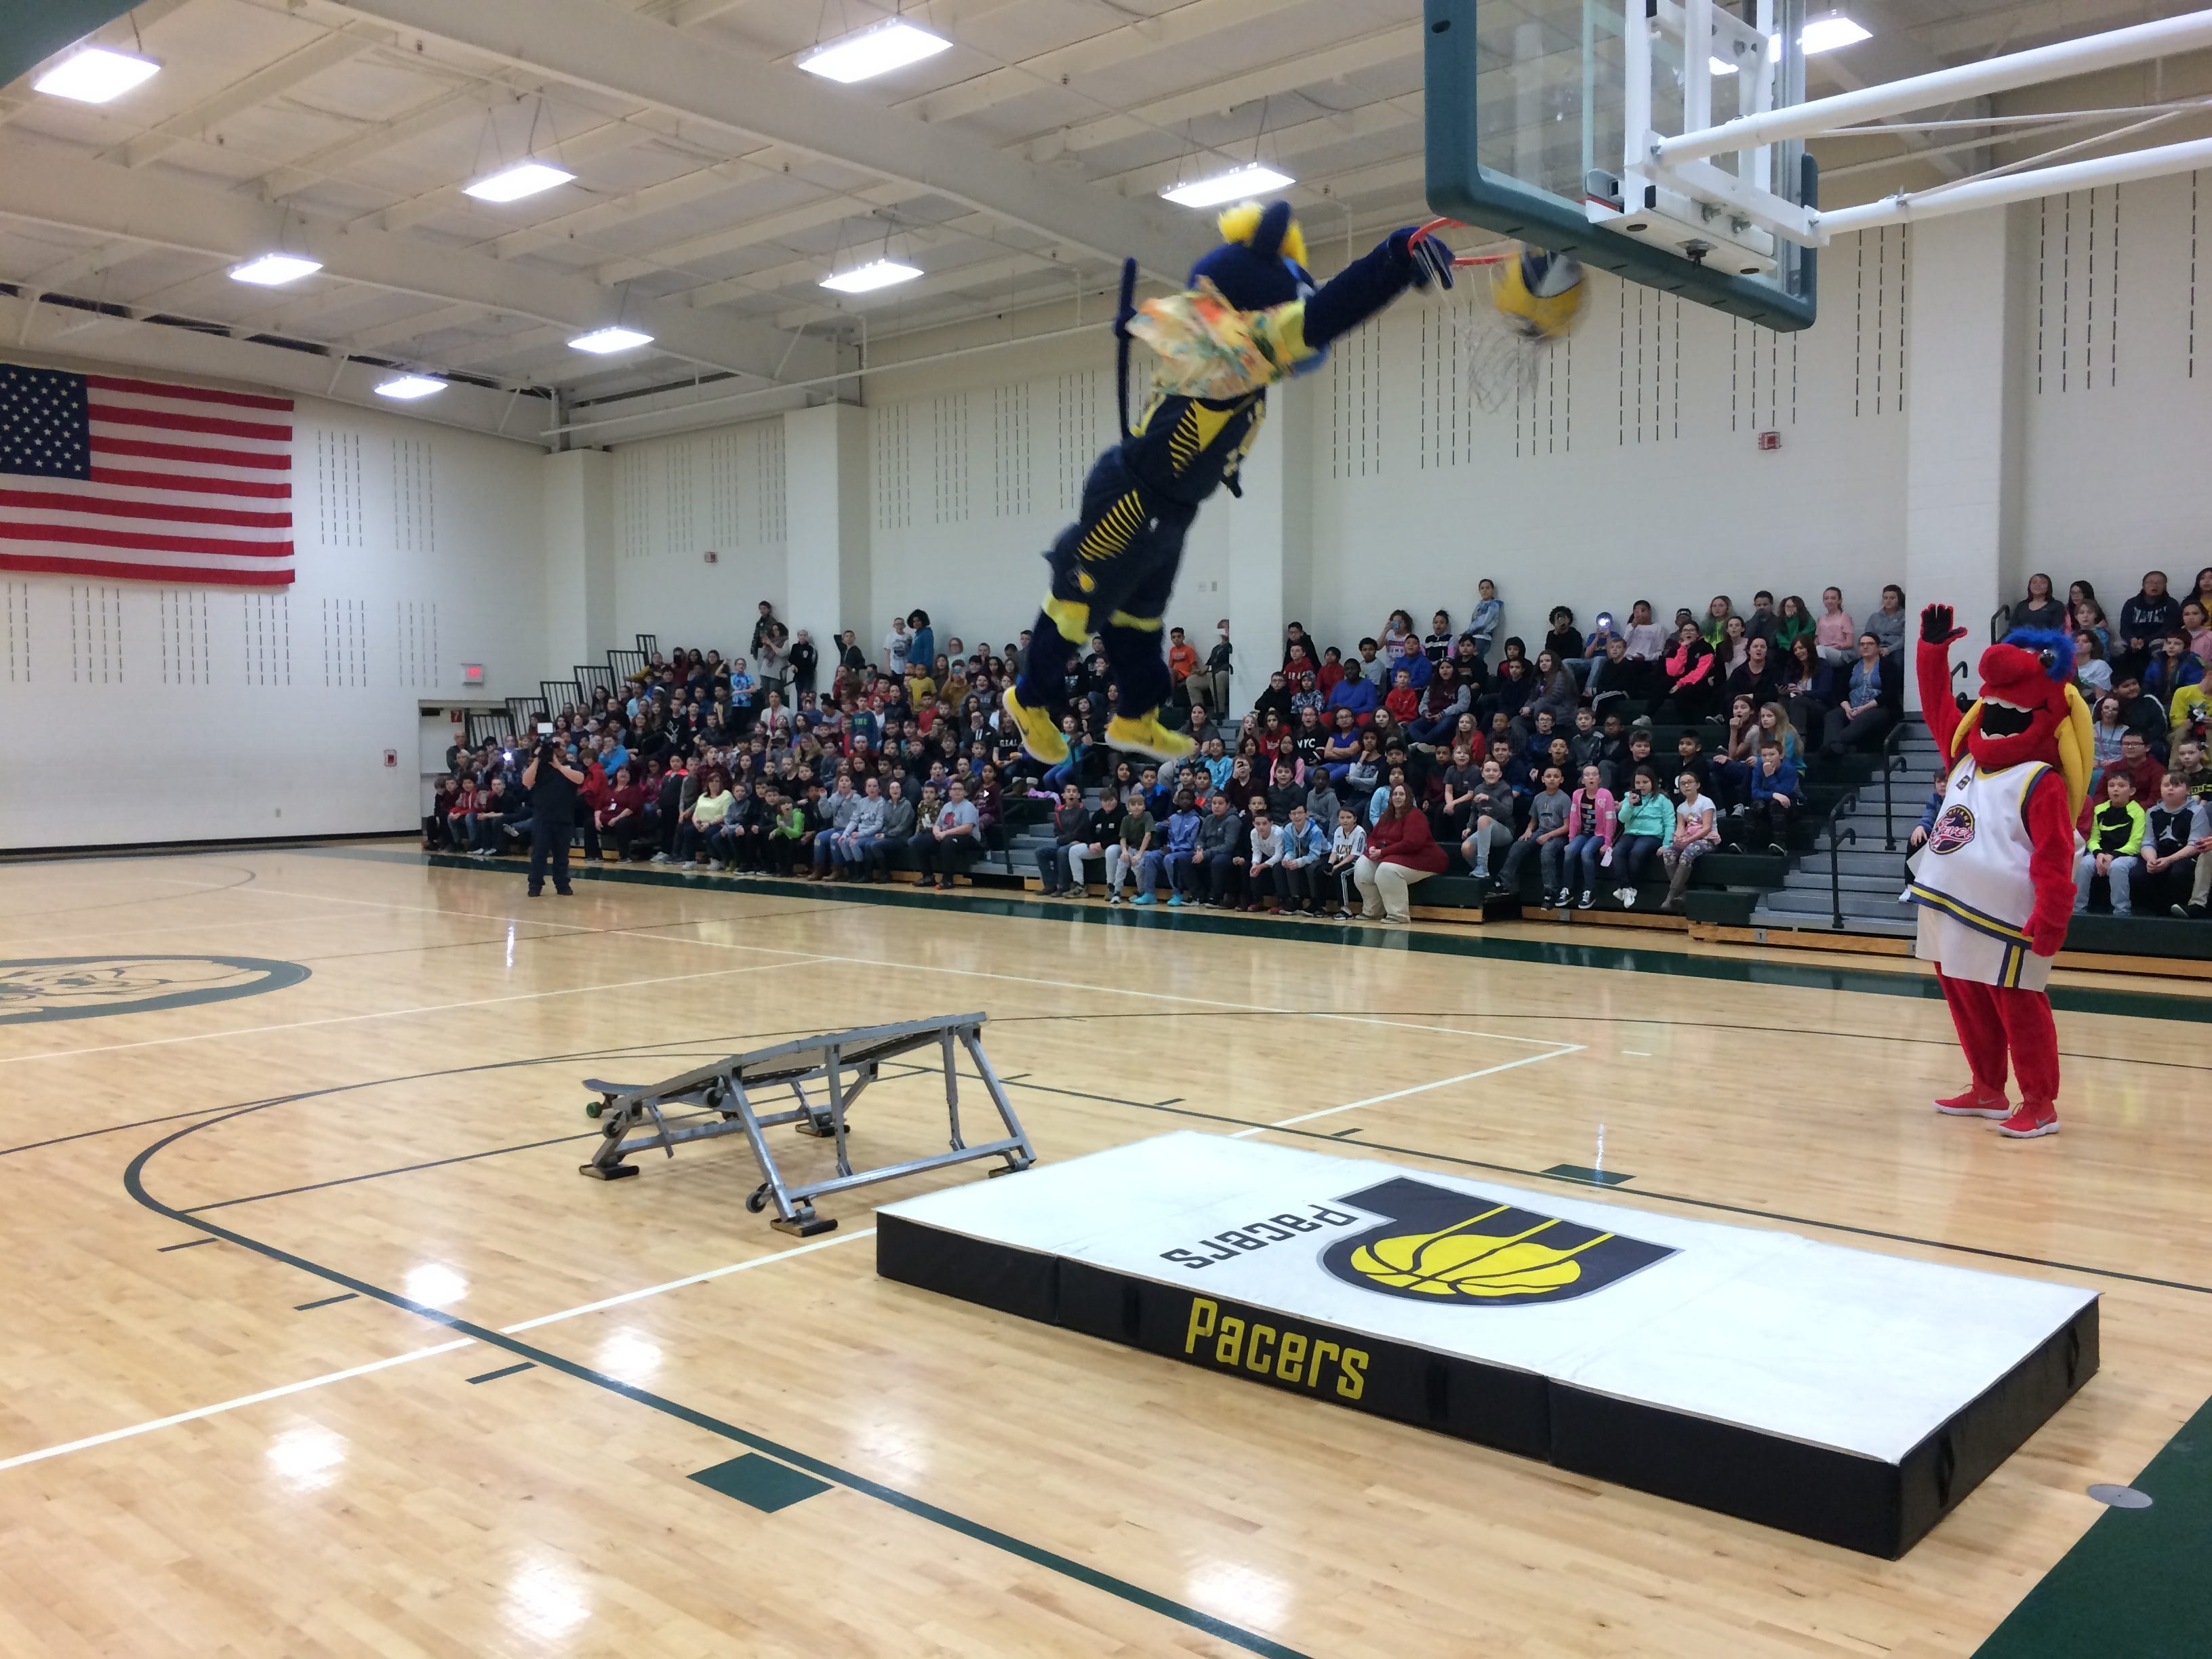 Boomer dunks during Wednesday's program in Dennis Intermediate School.